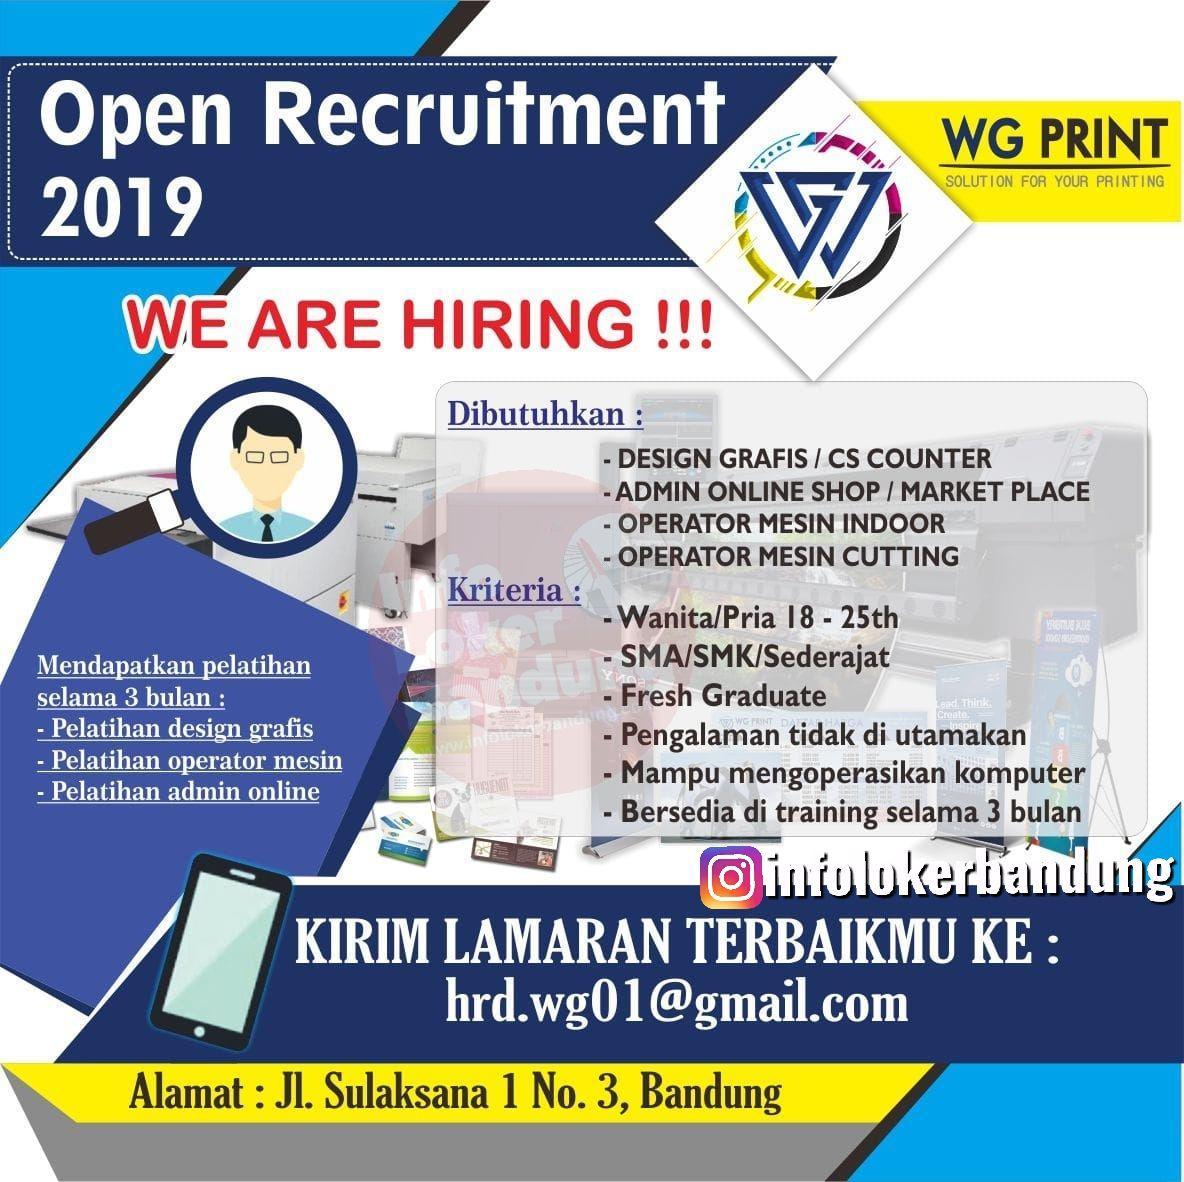 Lowongan Kerja WG Print Bandung Oktober 2019